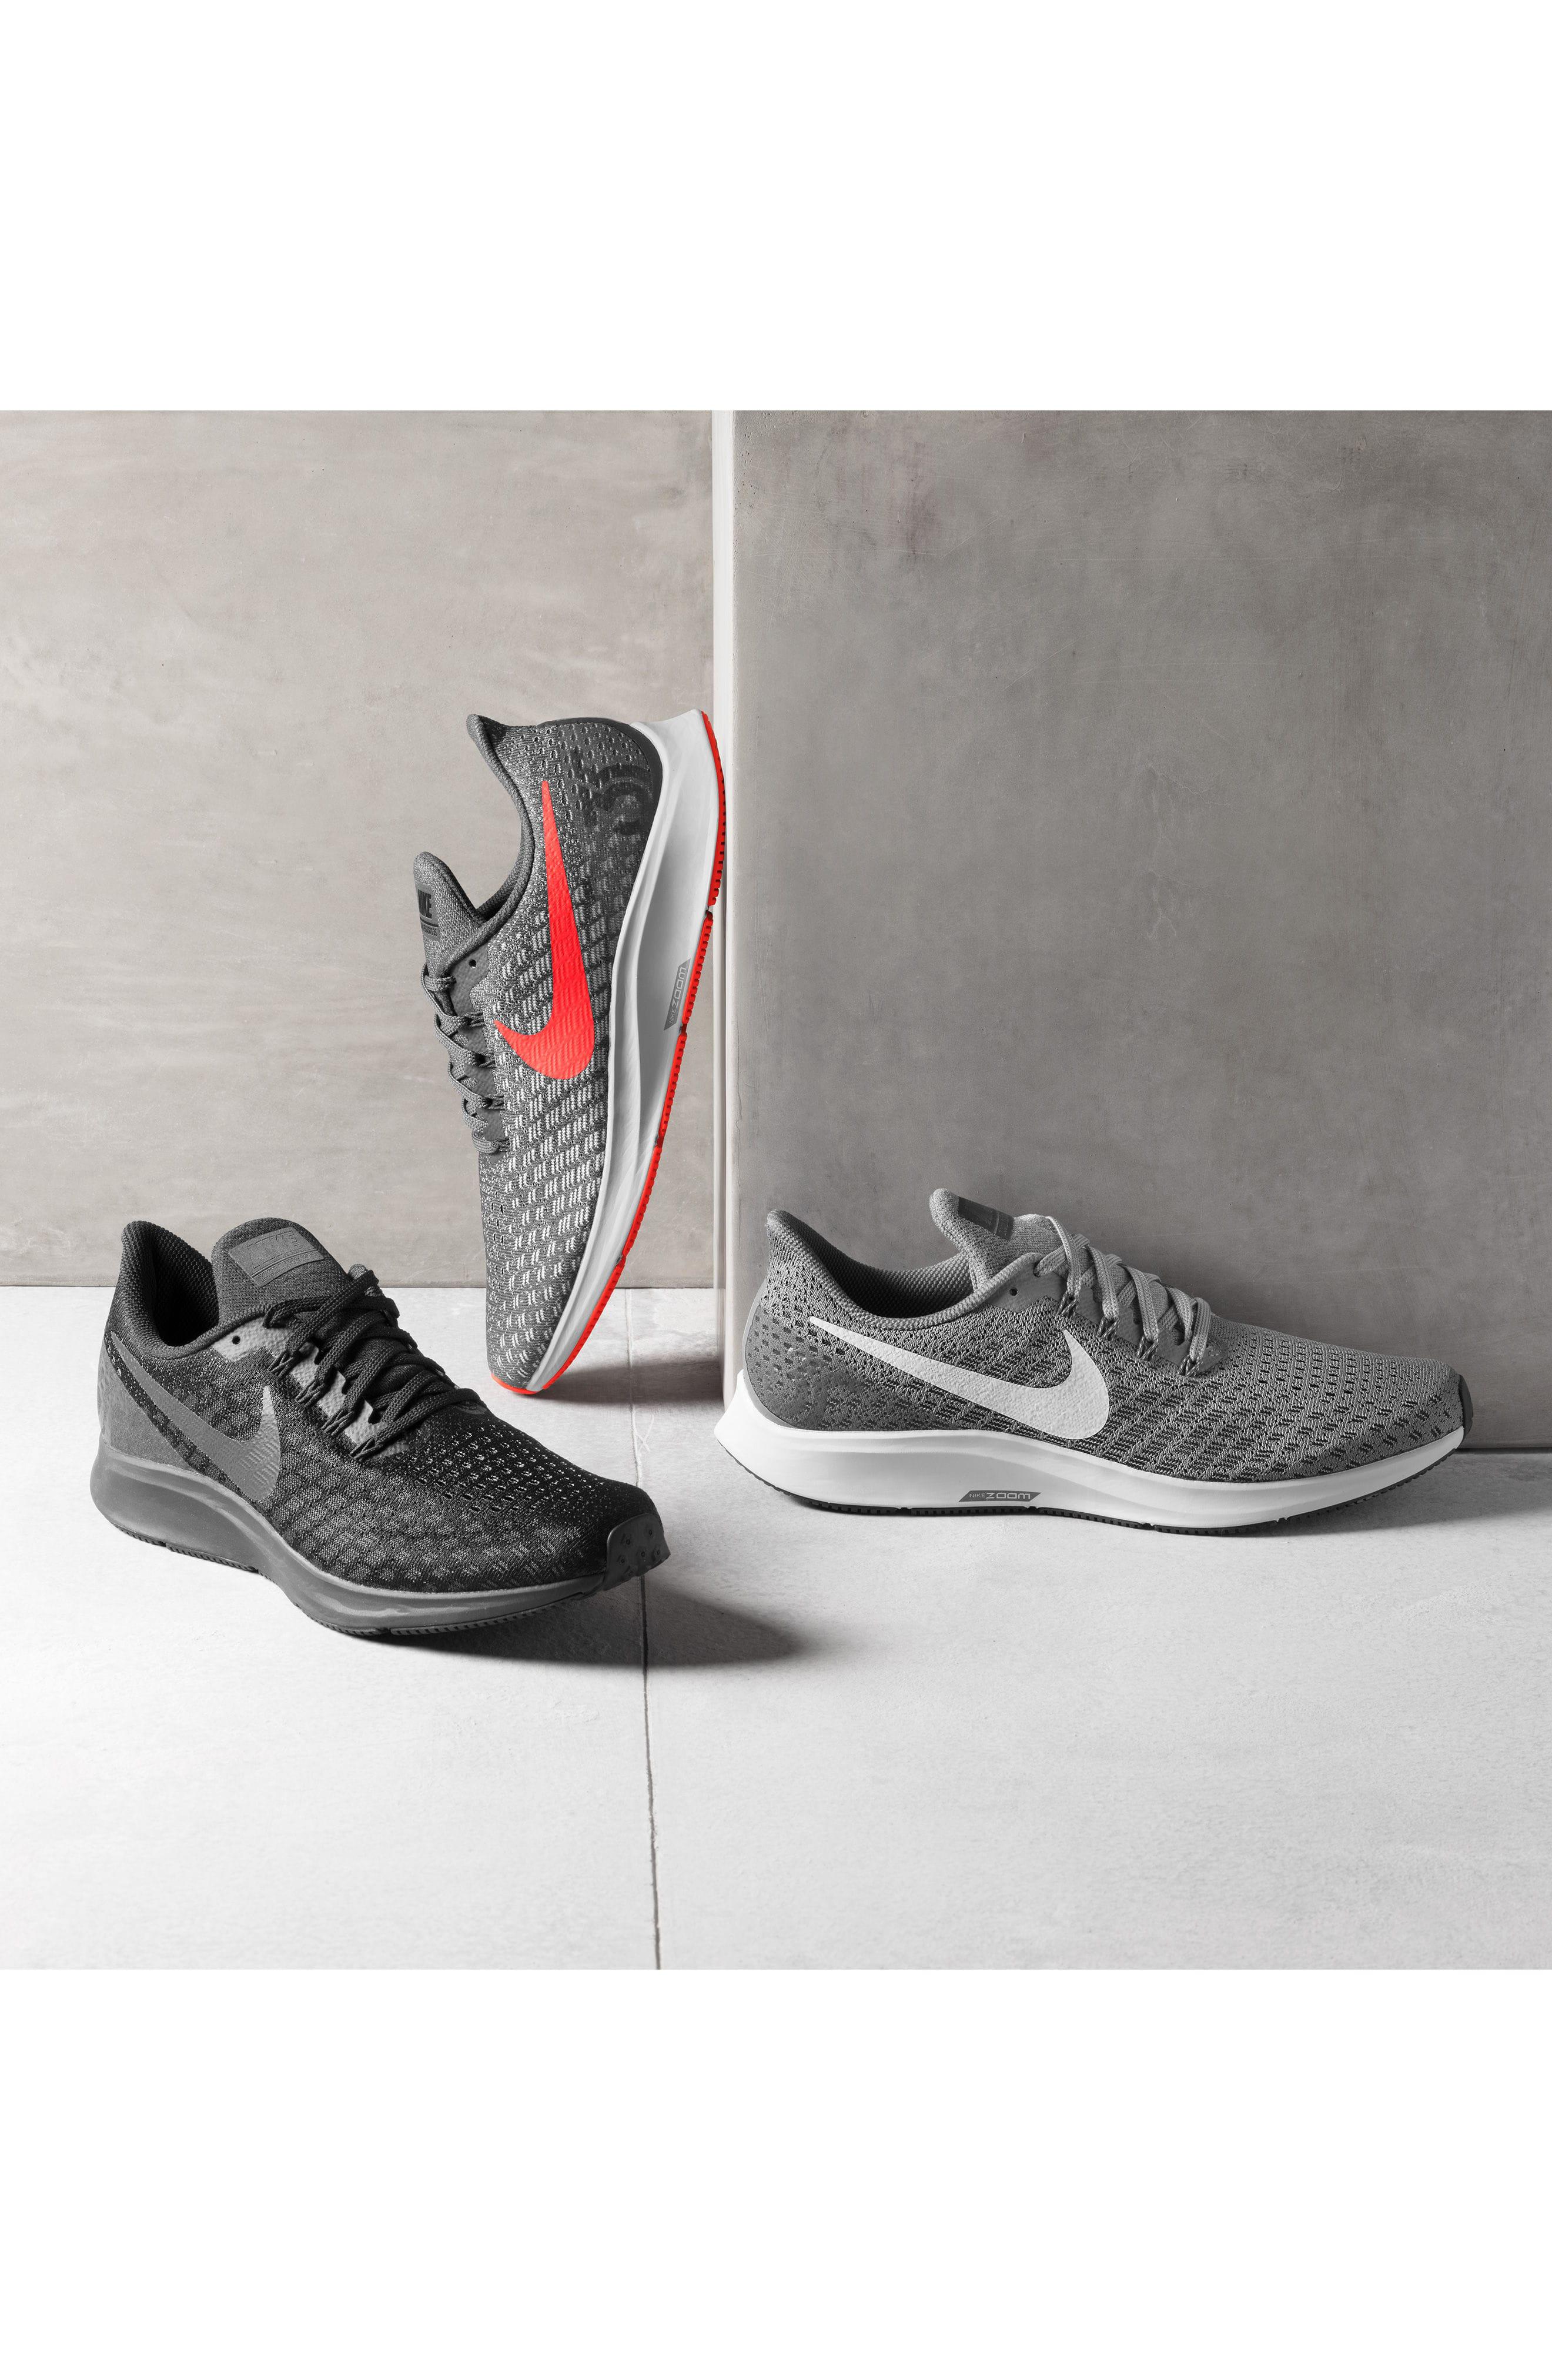 online store b44f1 0c75b Nike Air Zoom Pegasus 35 Running Shoe In Indigo White Photo Blue